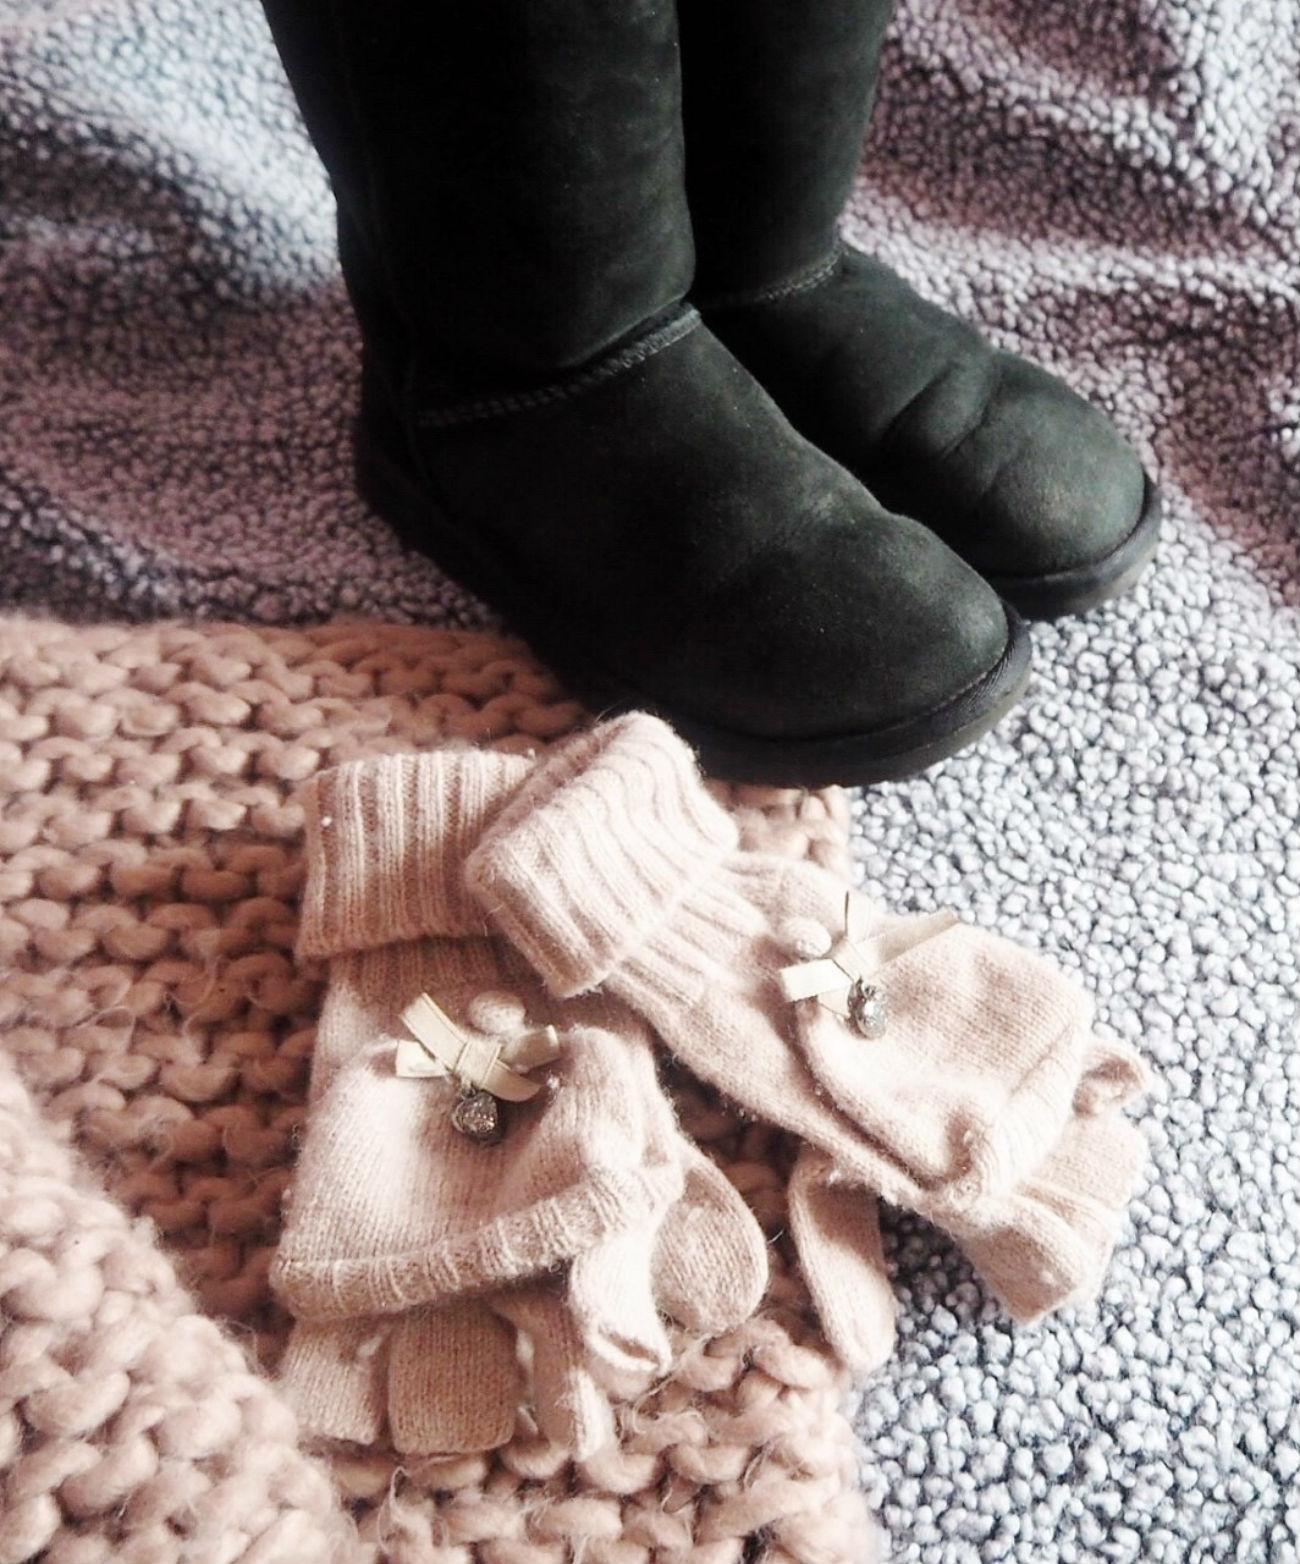 Tips for preparing your skin for winter